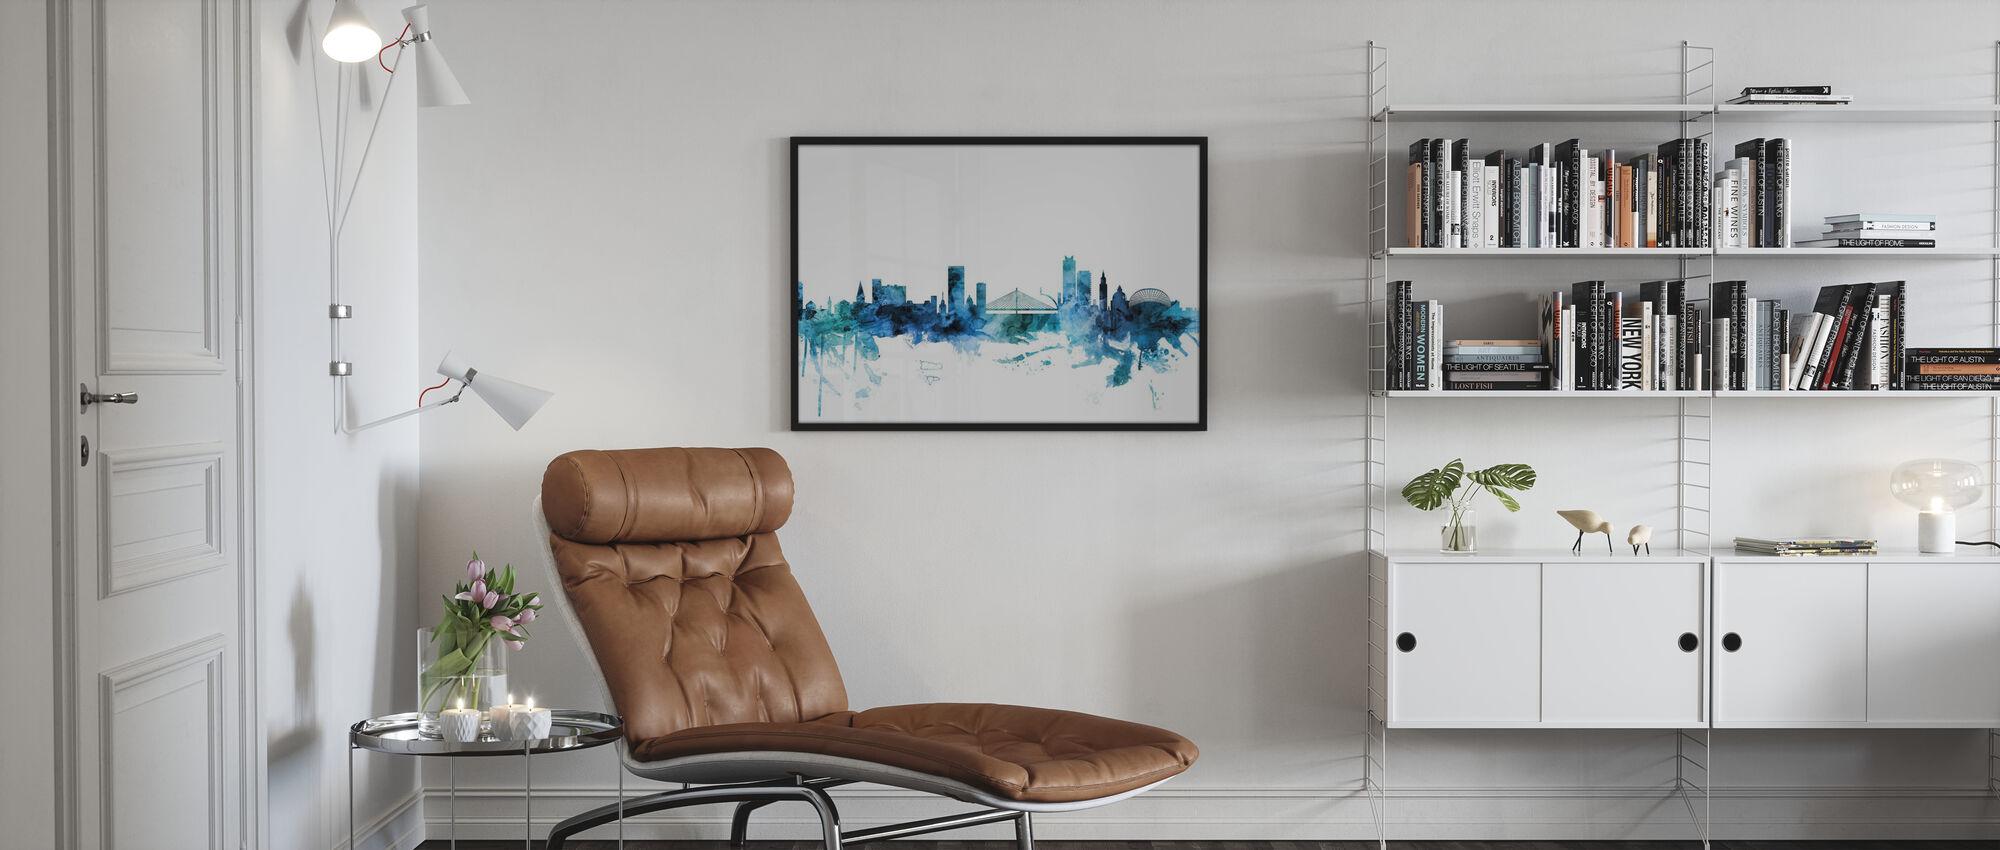 Liege Belgium Skyline - Framed print - Living Room